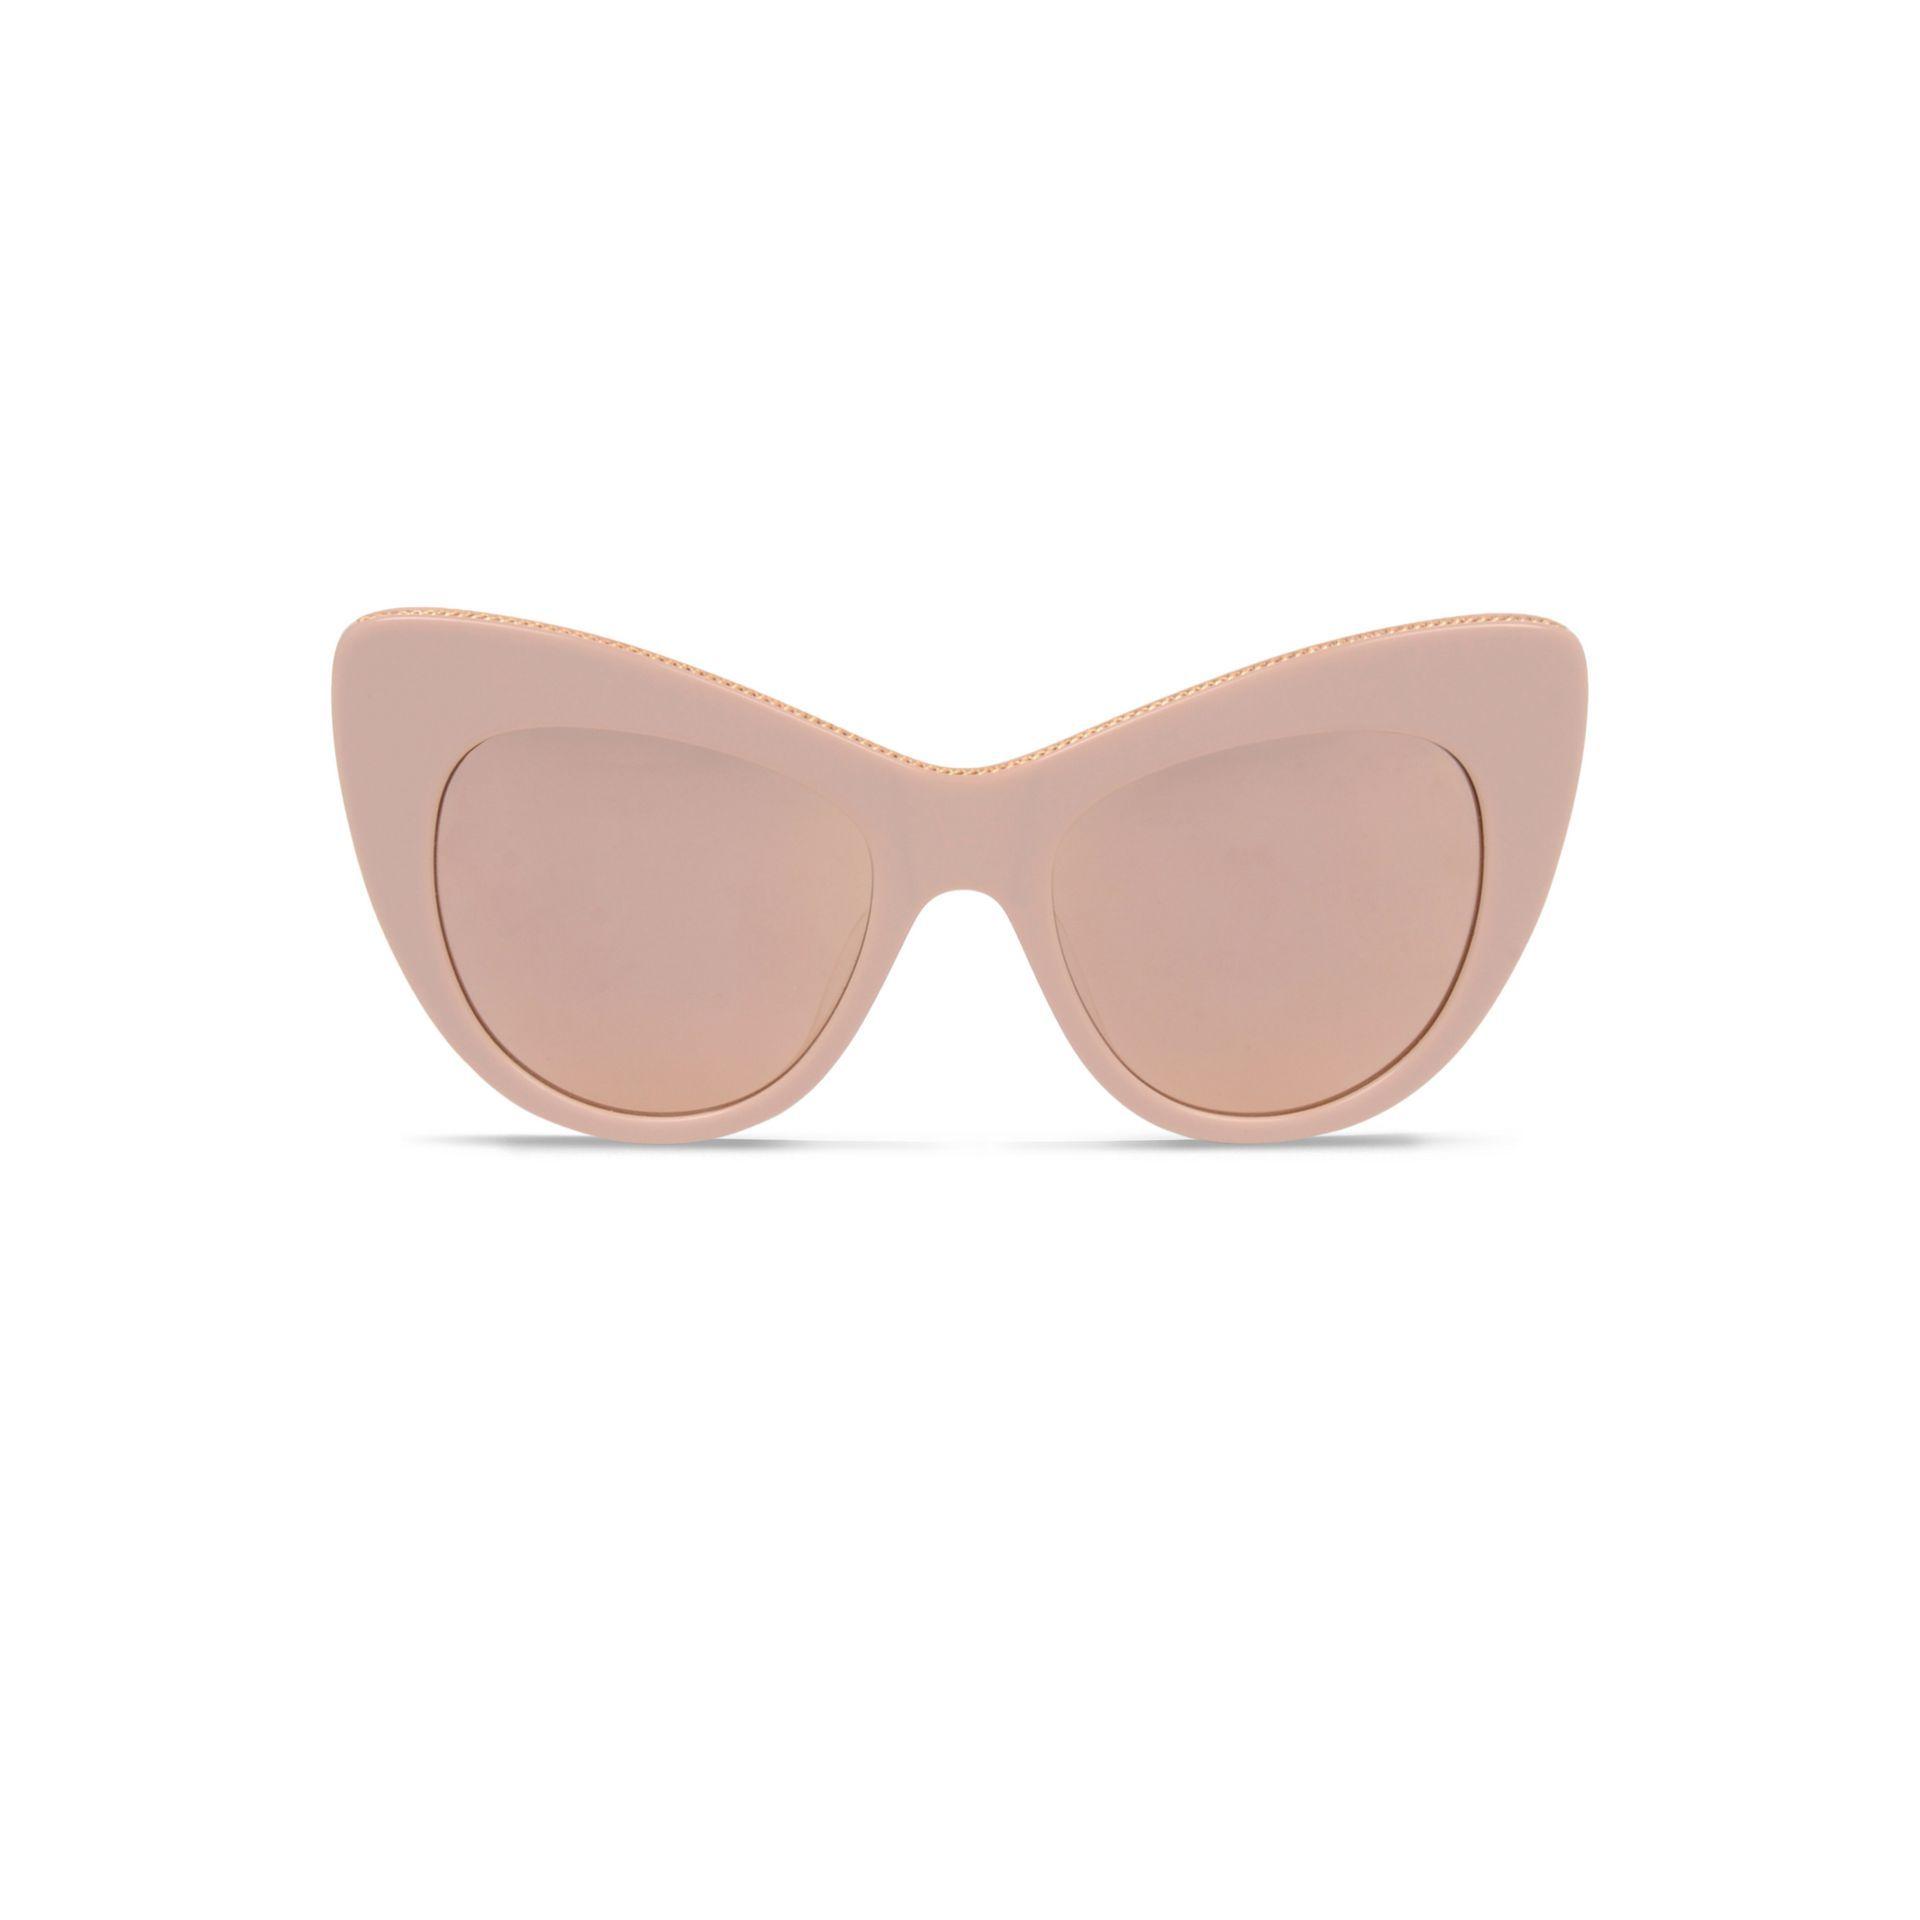 Oversized Stella Exaggerated Cat Eye Pin Up Girl Big Large: Rose Oversized Cat Eye Sunglasses - STELLA MCCARTNEY